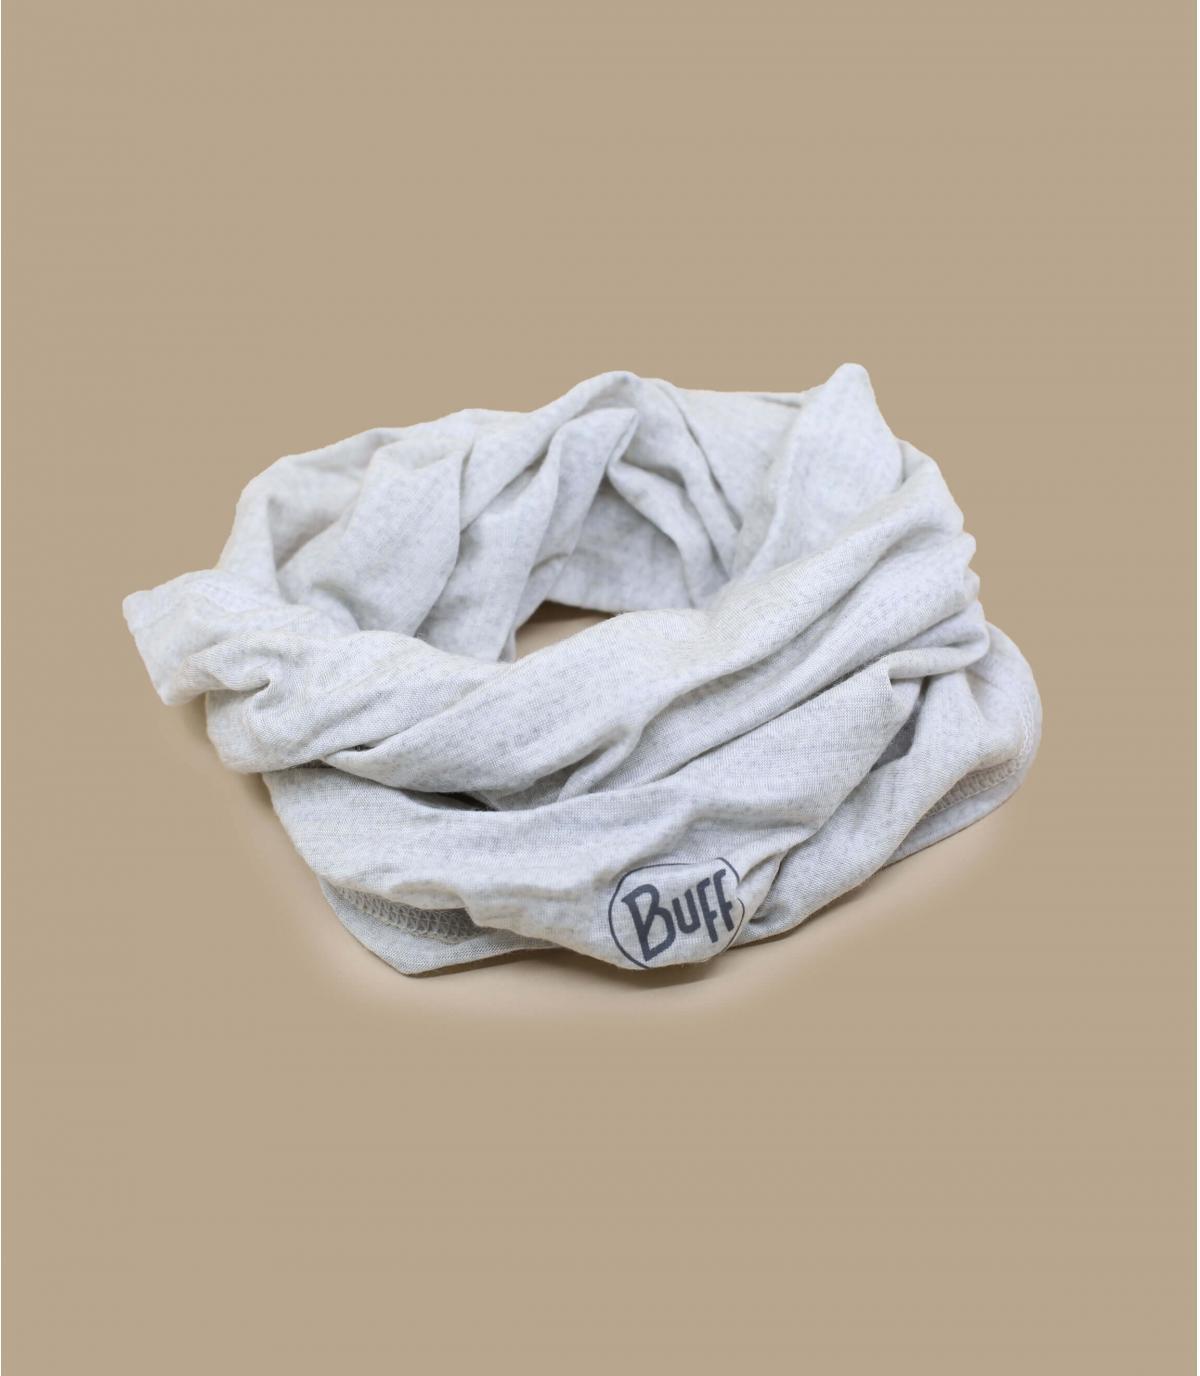 Buff blanc laine mérinos